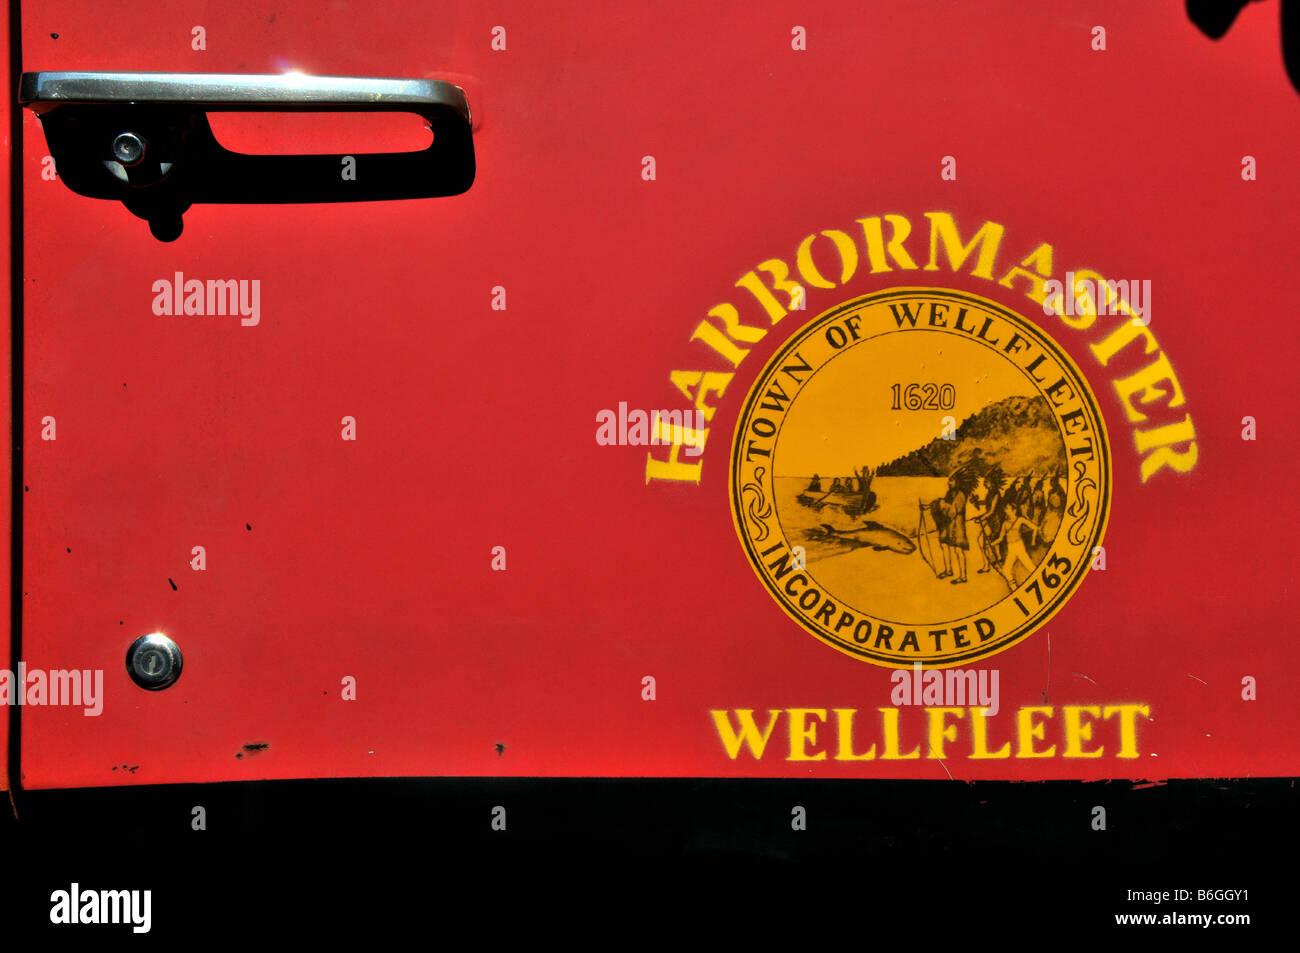 Harbormaster vehicle, Wellfleet, Cape Cod, USA - Stock Image